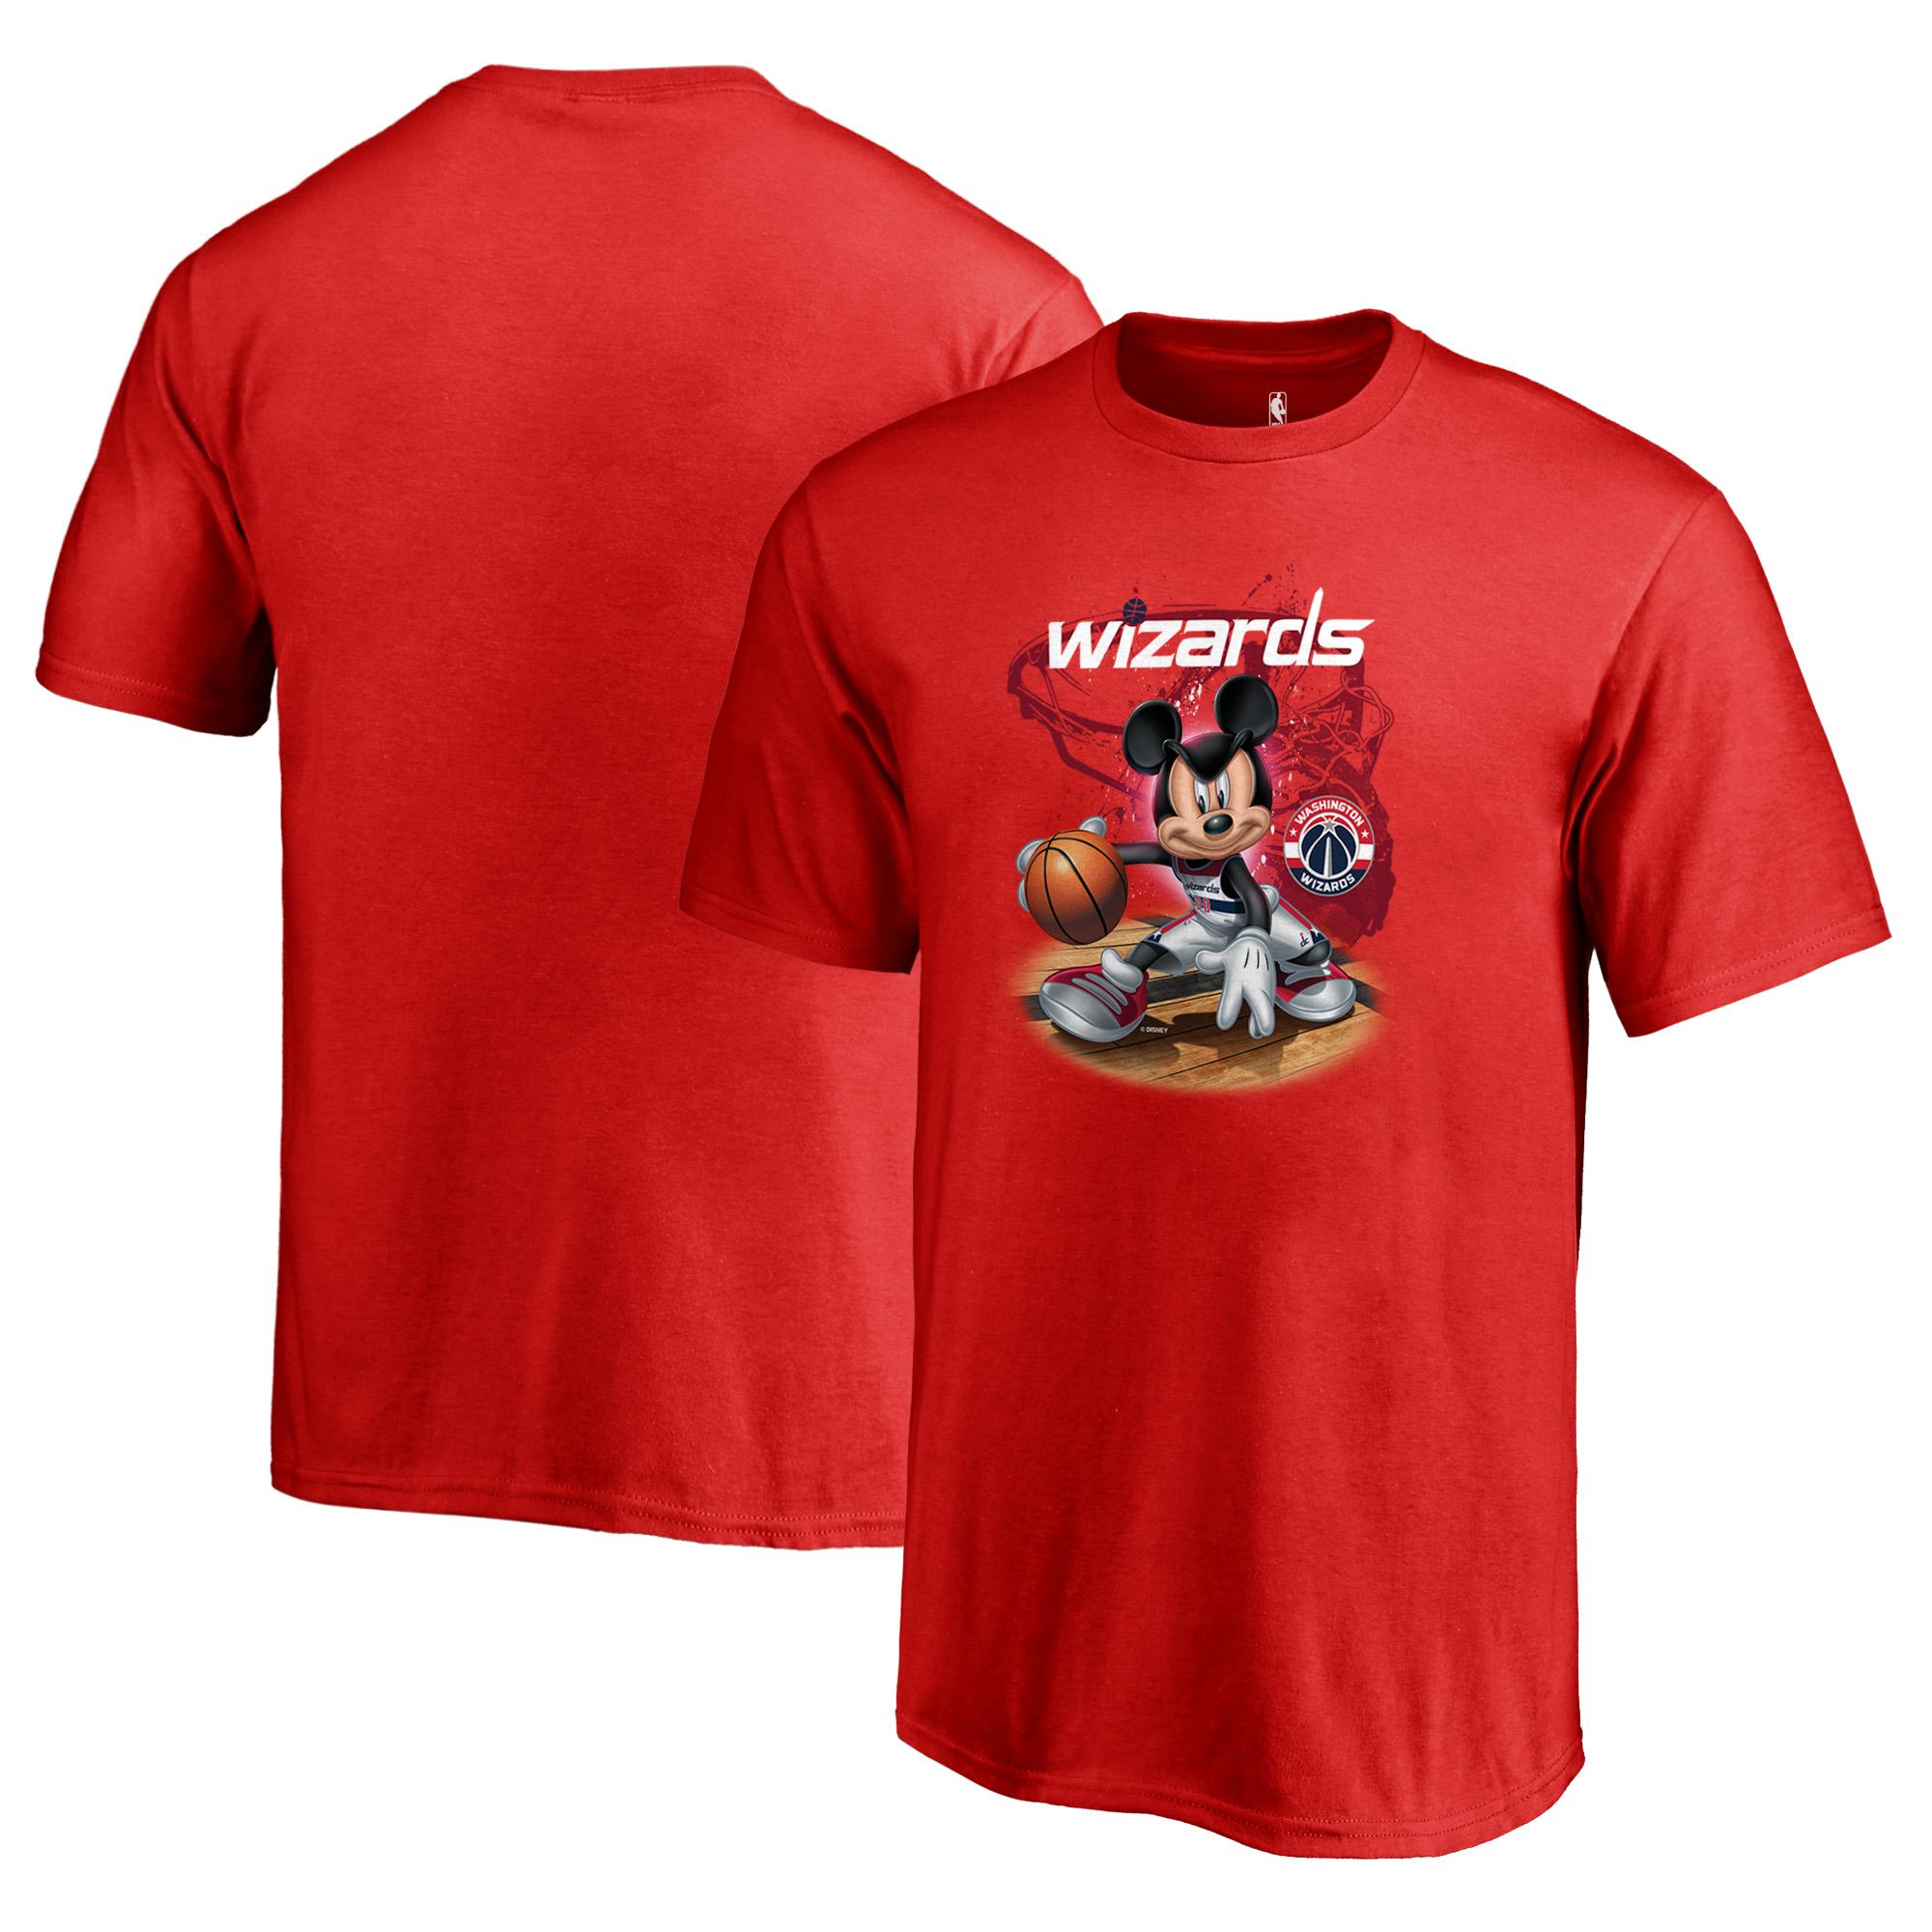 Washington Wizards Fanatics Branded Youth Disney NBA All-Star T-Shirt - Red